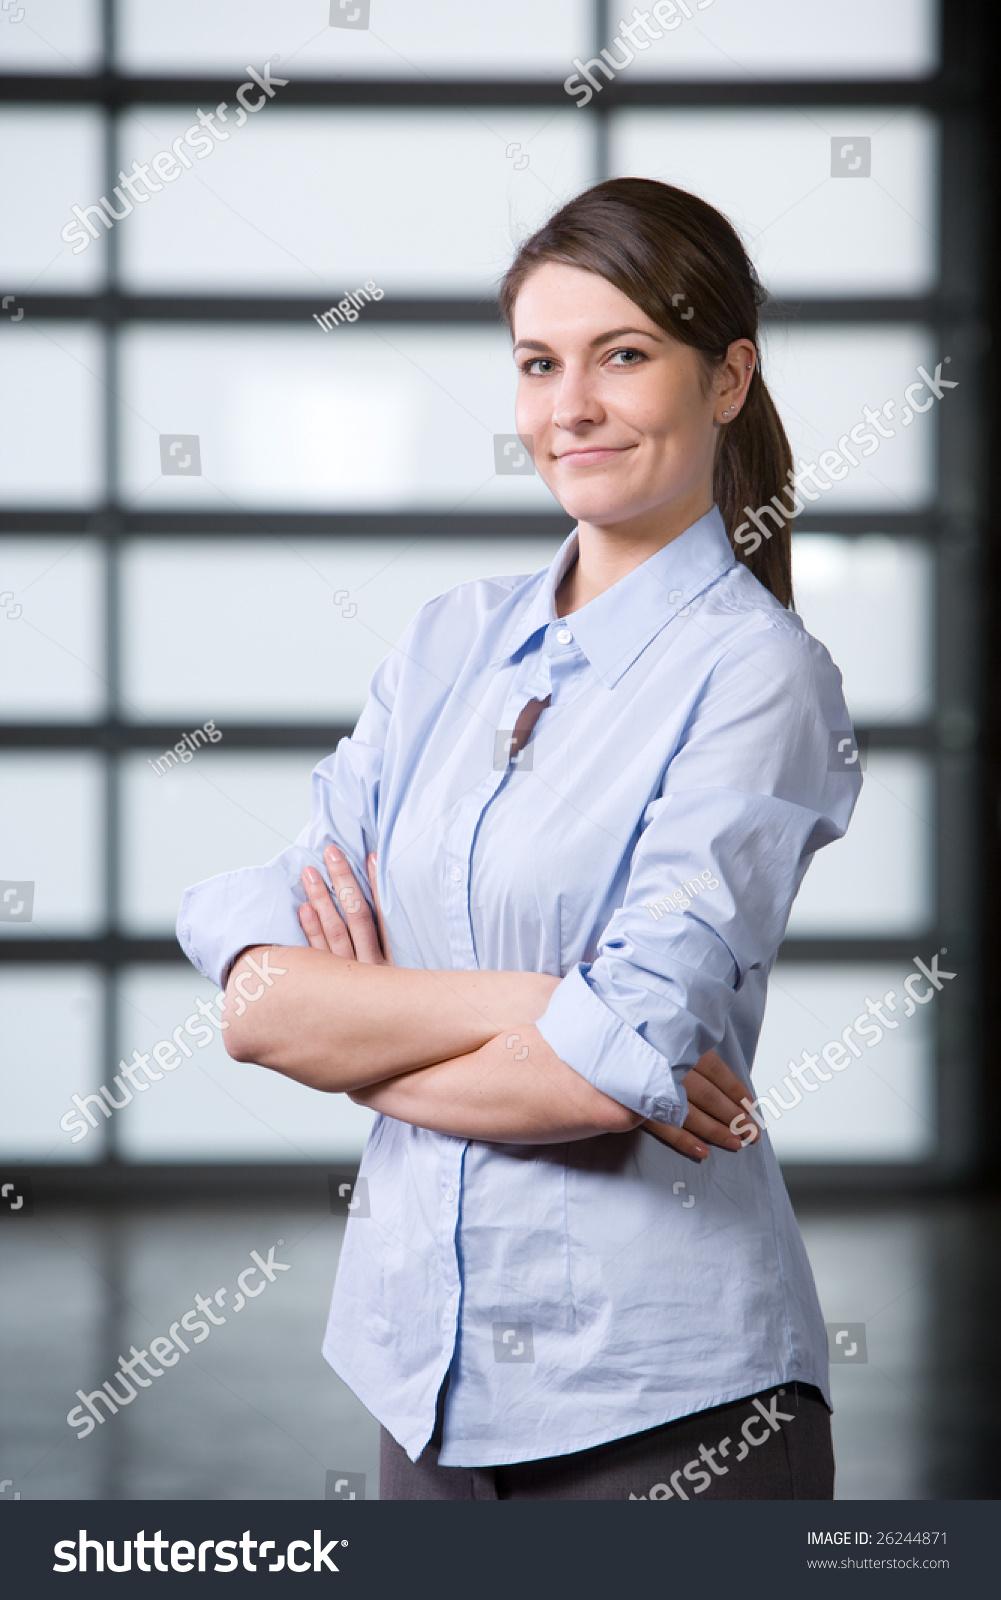 Business woman portrait modern office stock photo 26244871 shutterstock - Office portrait photography ...